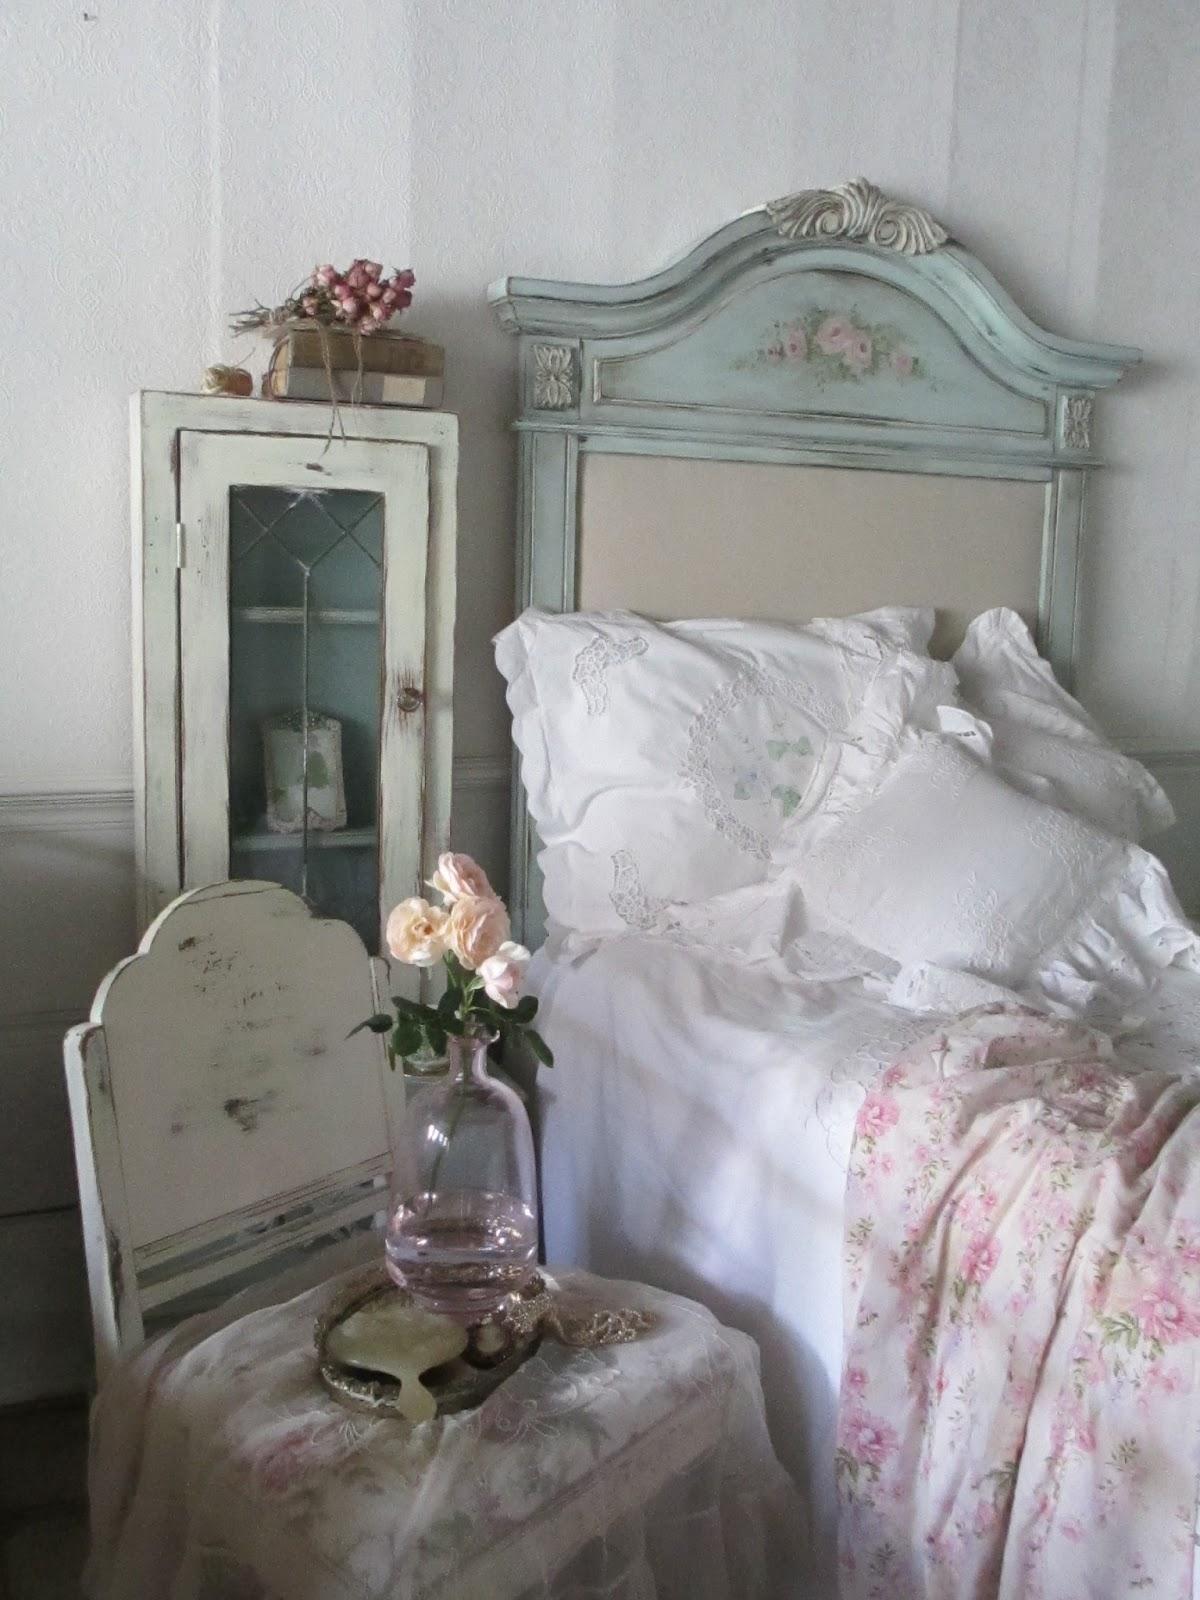 my place 4 tea trash to treasure headboard. Black Bedroom Furniture Sets. Home Design Ideas